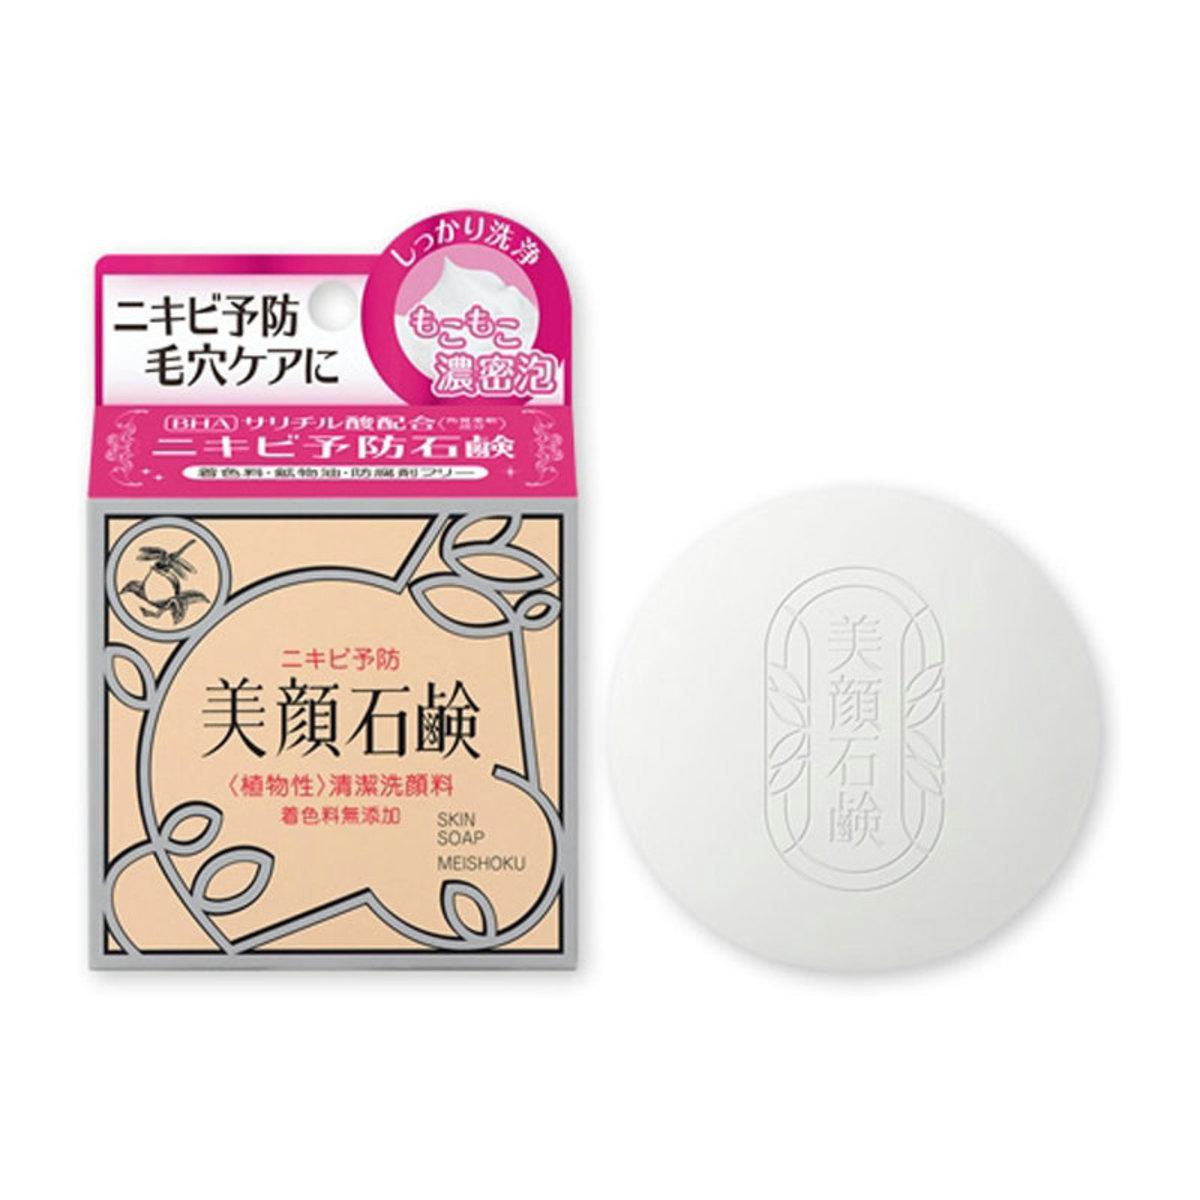 MEISHOKU Skin Soap 明色 美顏石鹼洗面皂80g 桃紅橙(4902468113703)